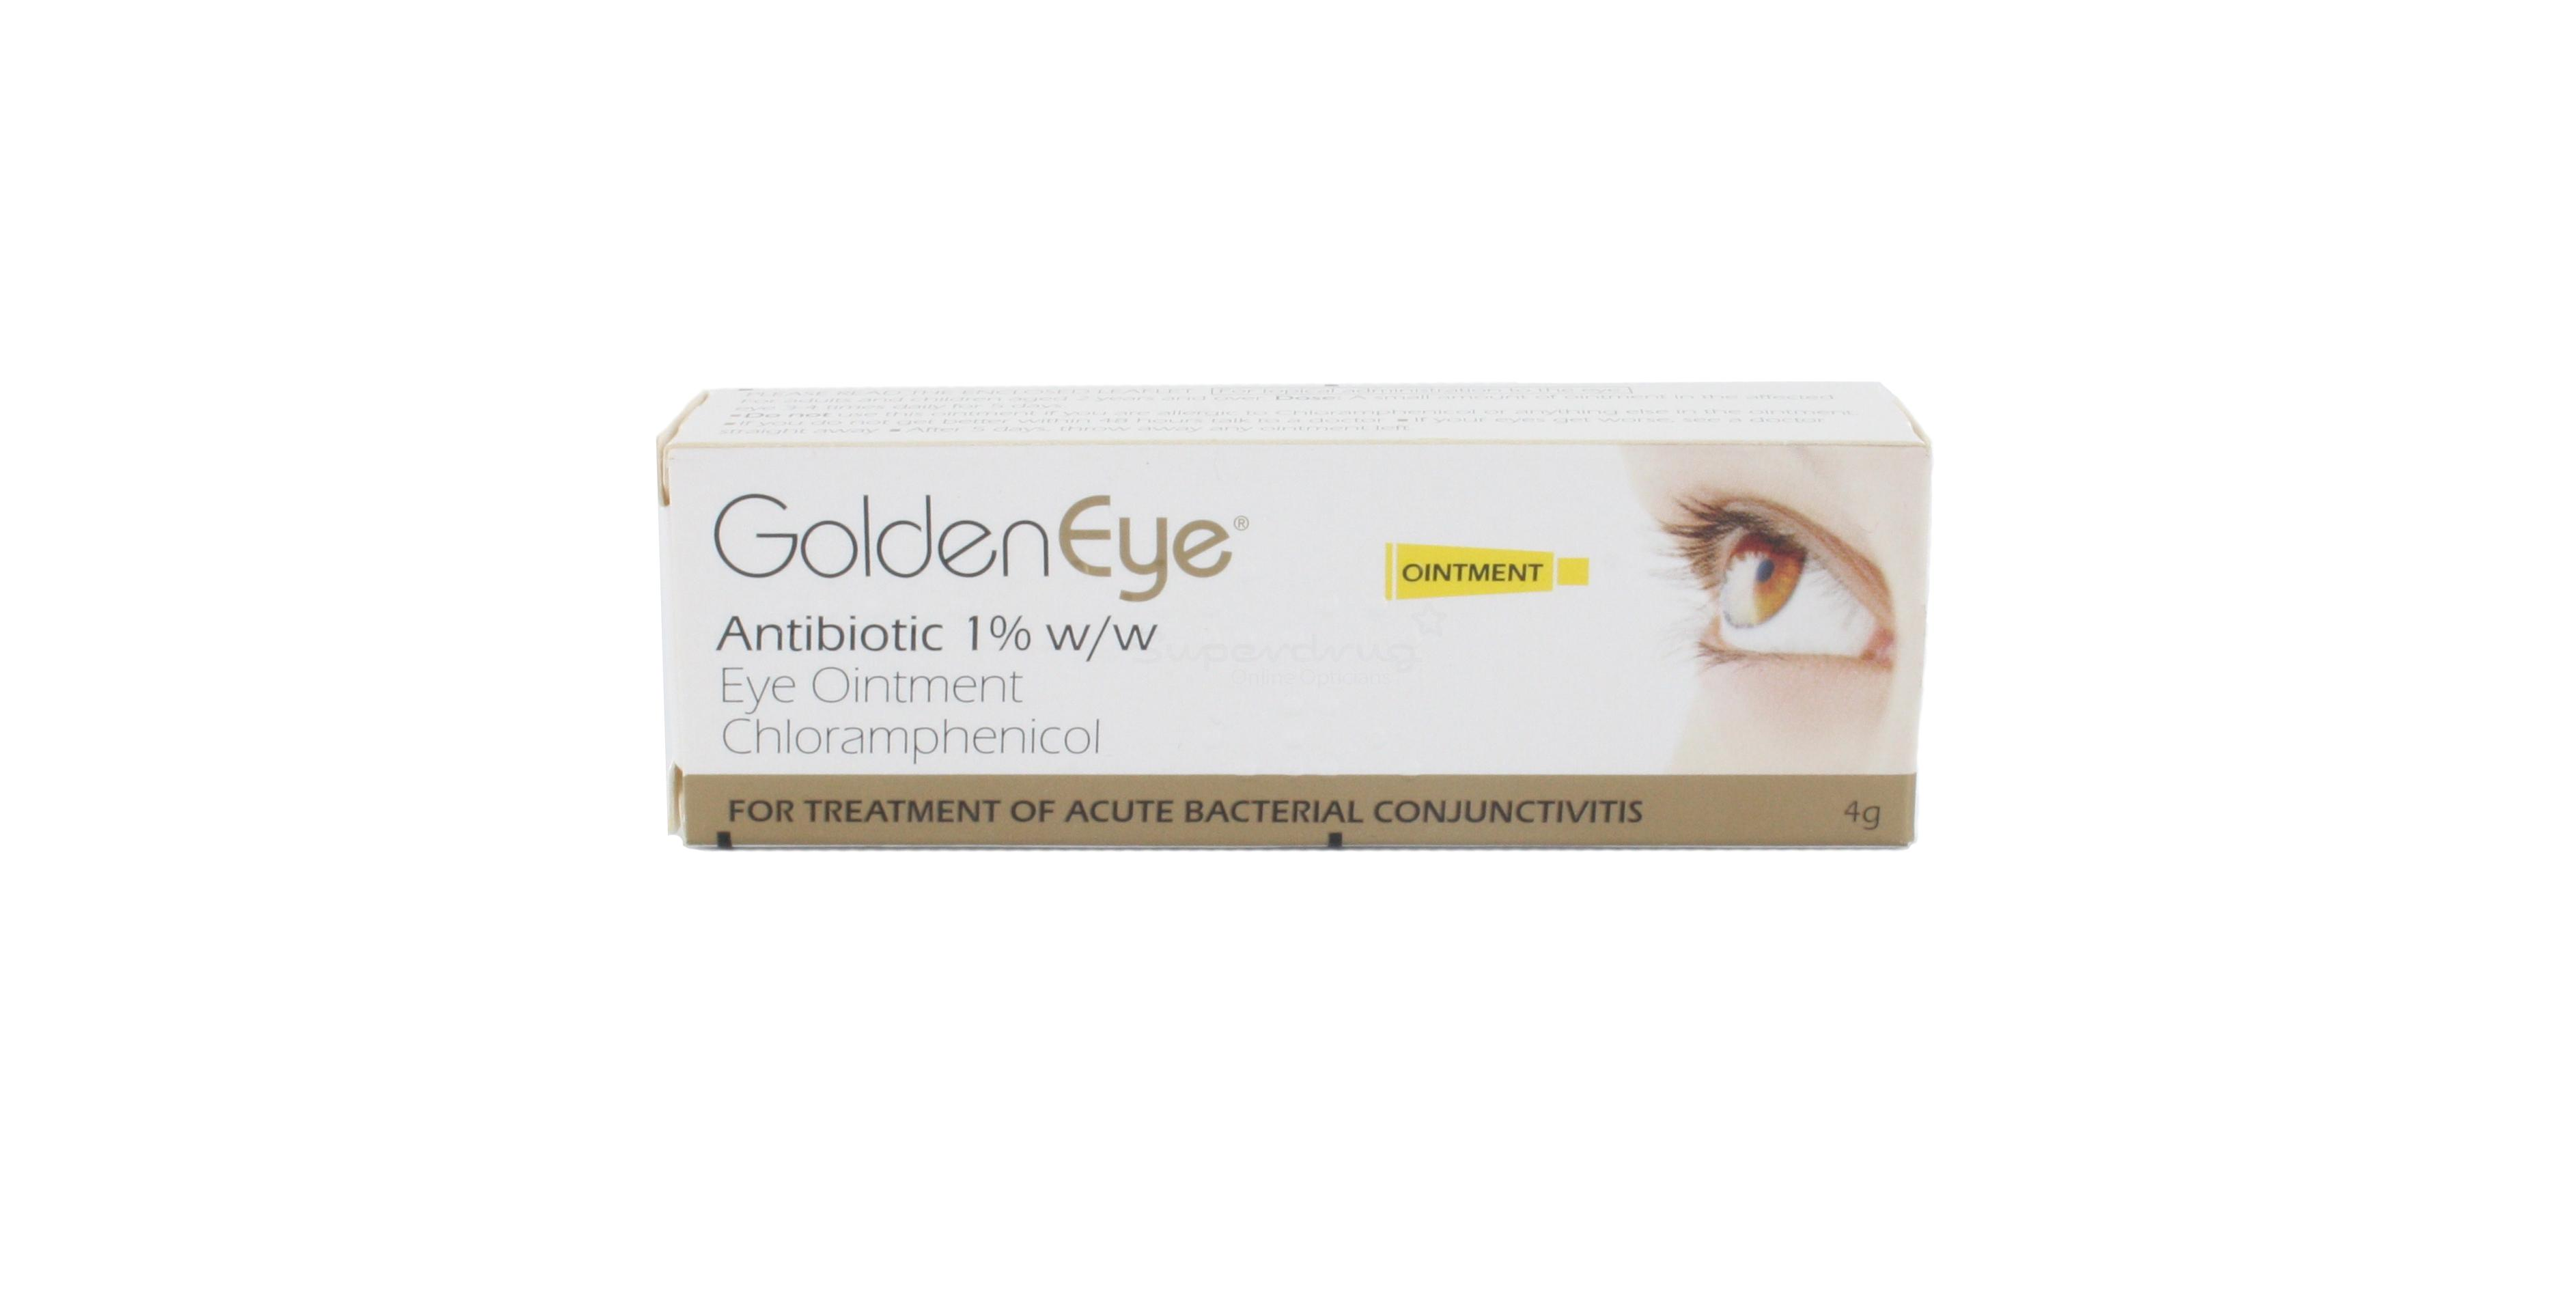 Eye Ointment Chloramphenicol Golden Eye Antibiotic Eye Ointment Chloramphenicol Accessories, Optical accessories